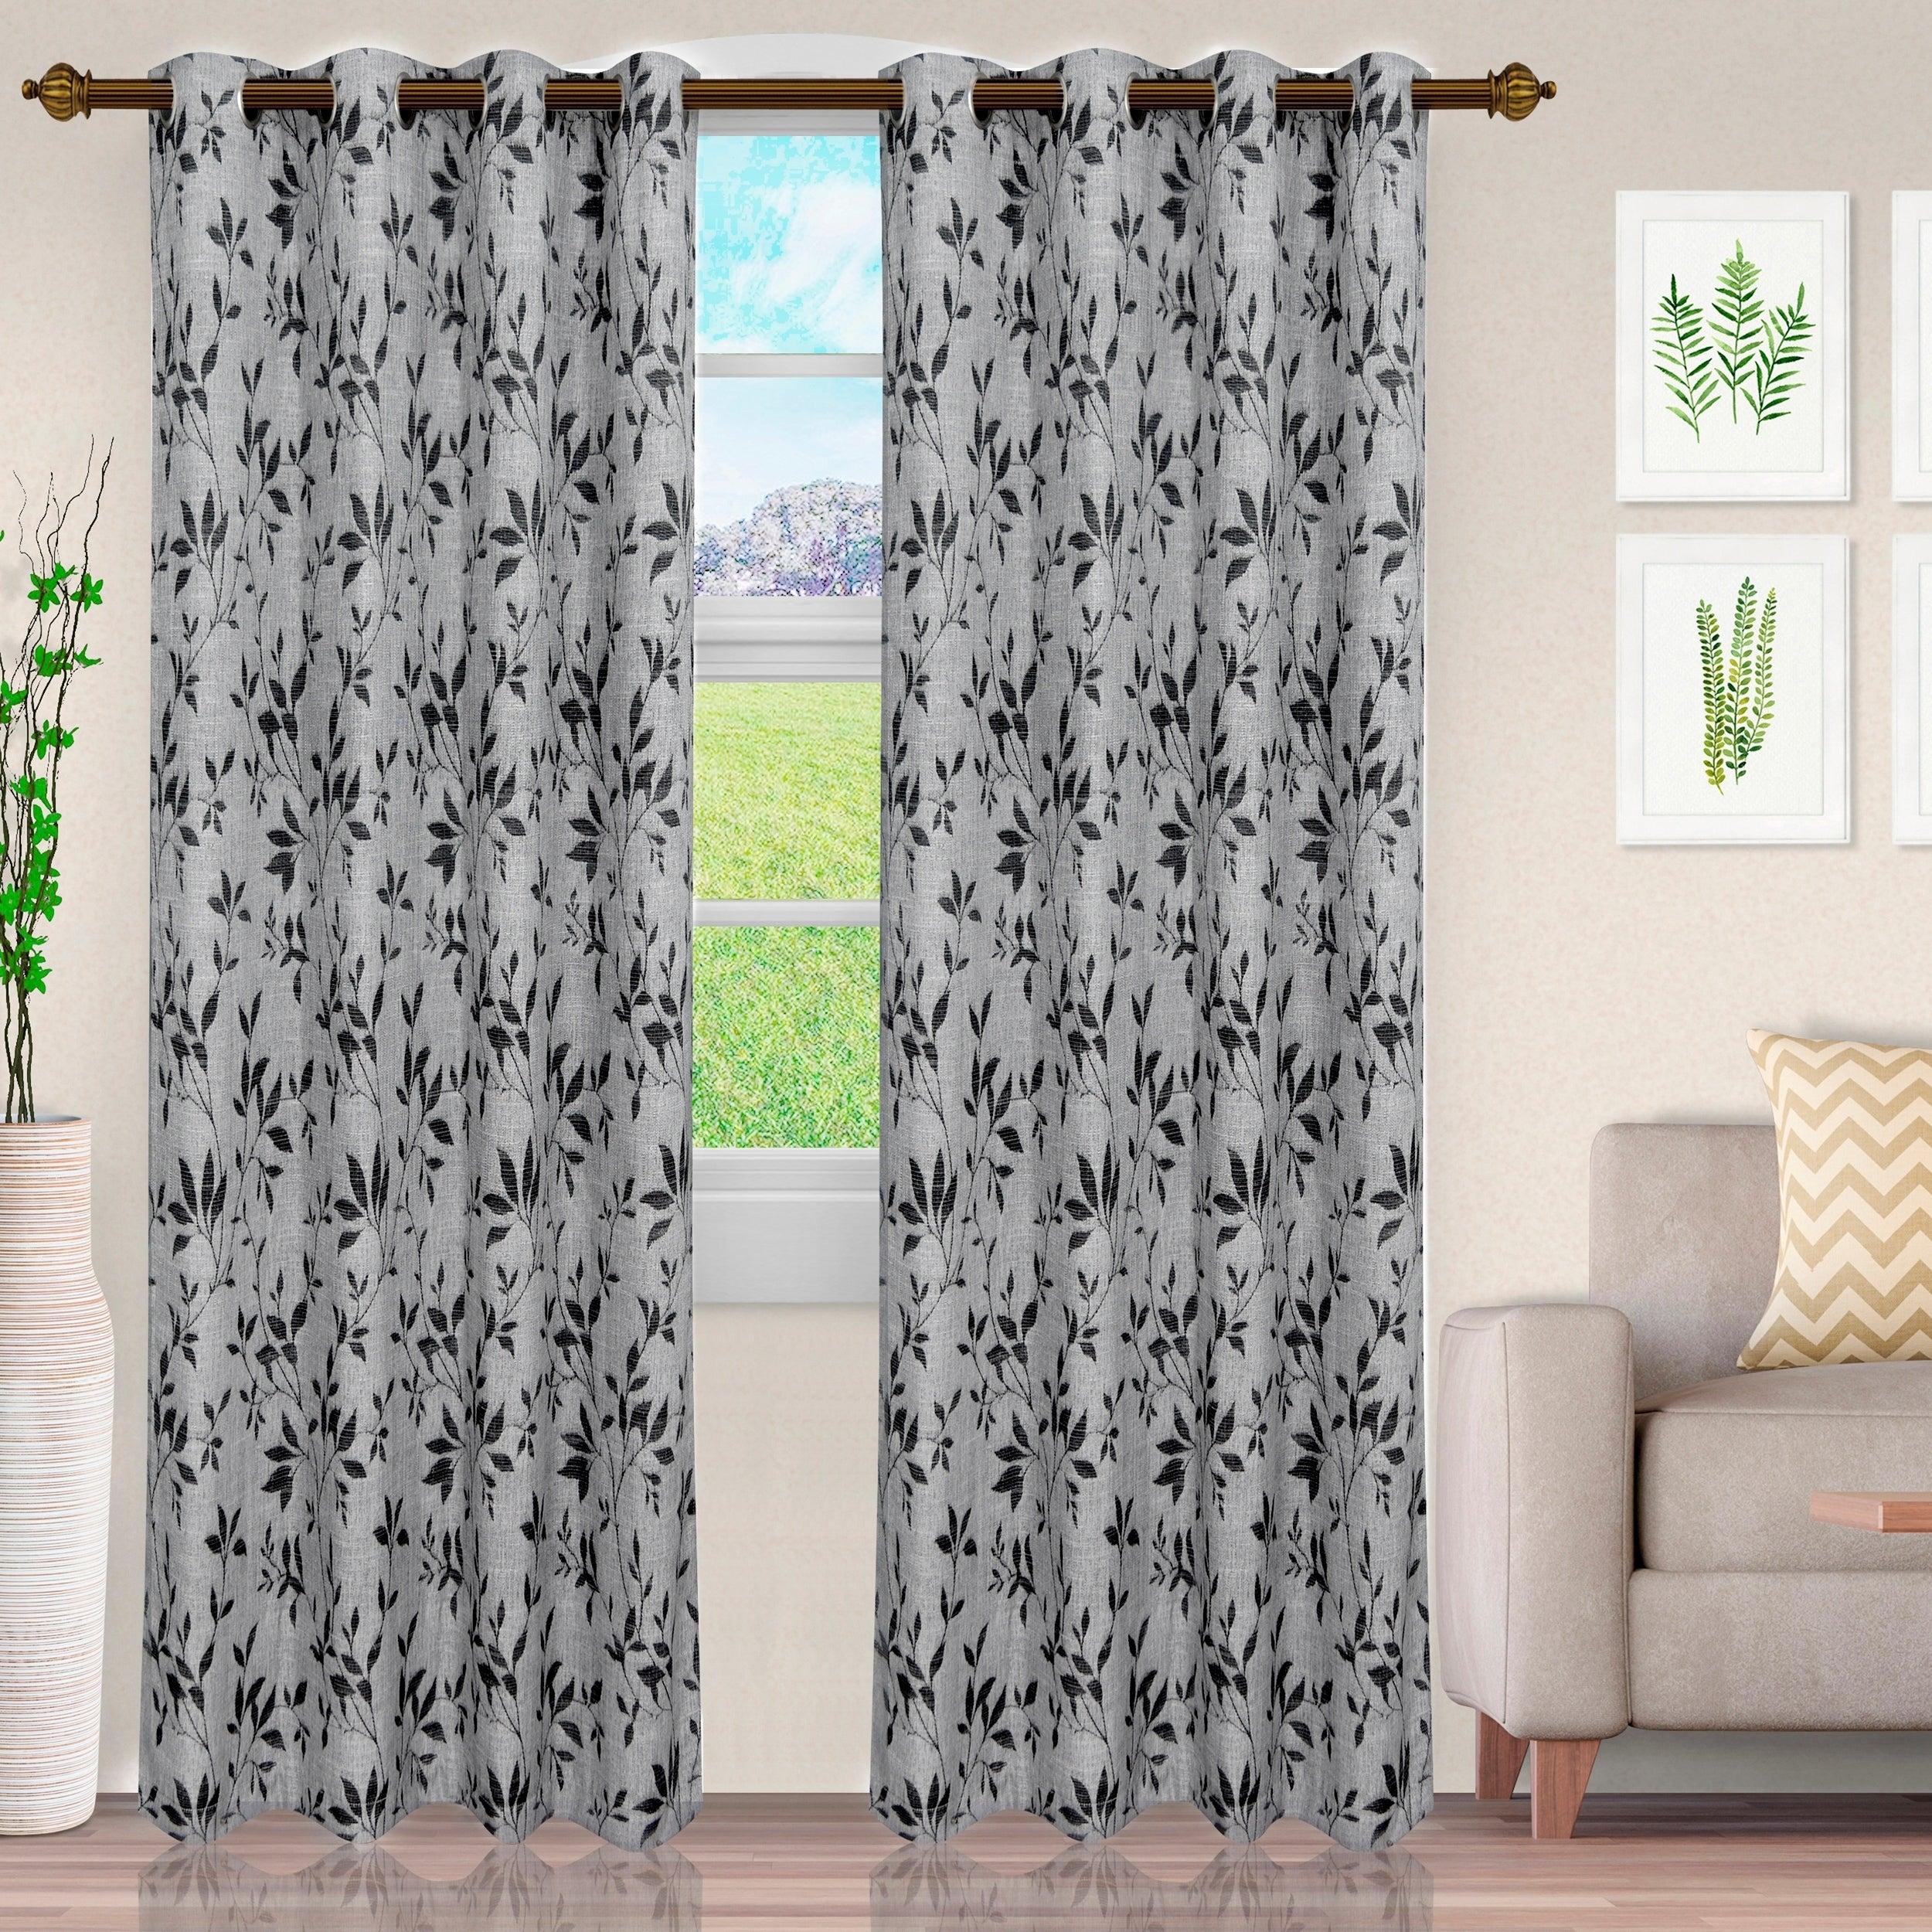 Miranda Haus Comera Jacquard Grommet Curtain Panel (set Of 2) With Regard To Miranda Haus Labrea Damask Jacquard Grommet Curtain Panels (View 12 of 20)